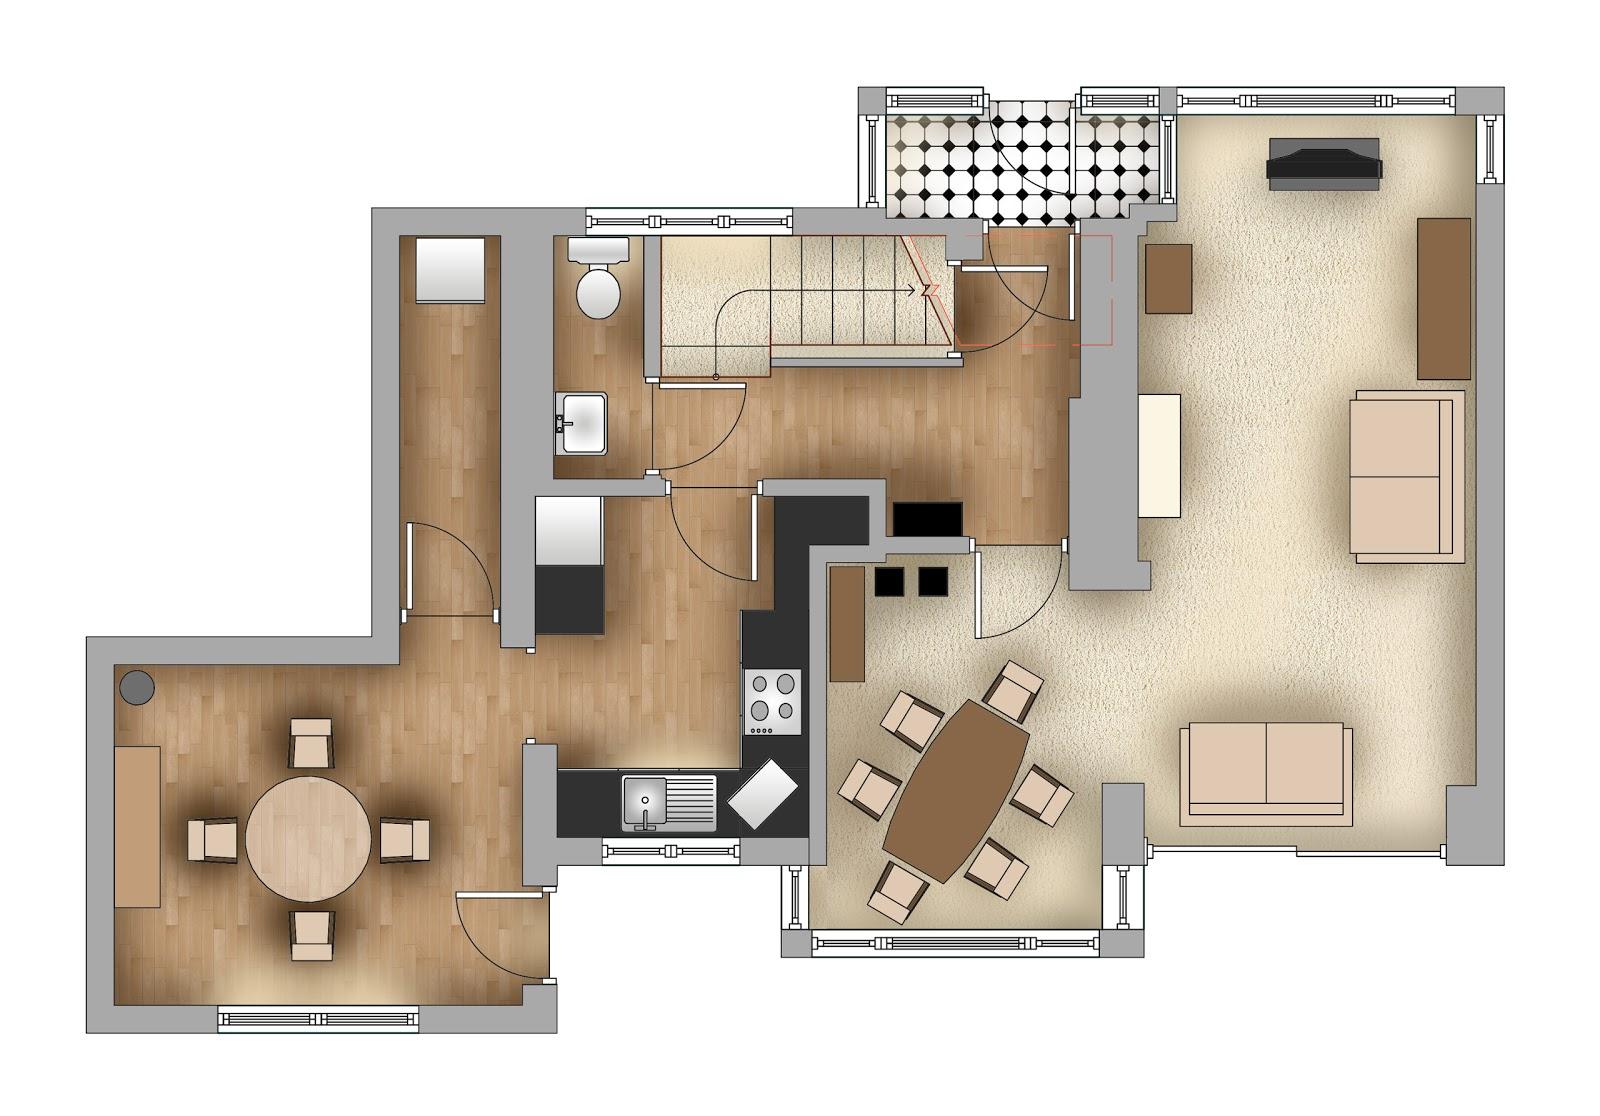 28 rendered floor plan floor plan rendering drawing for Rendered floor plan